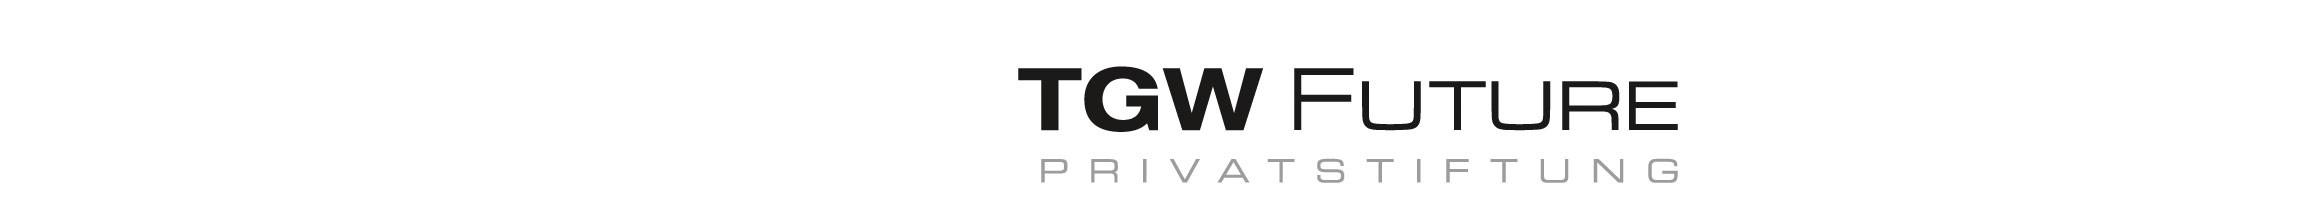 TGW Future Privatstiftung